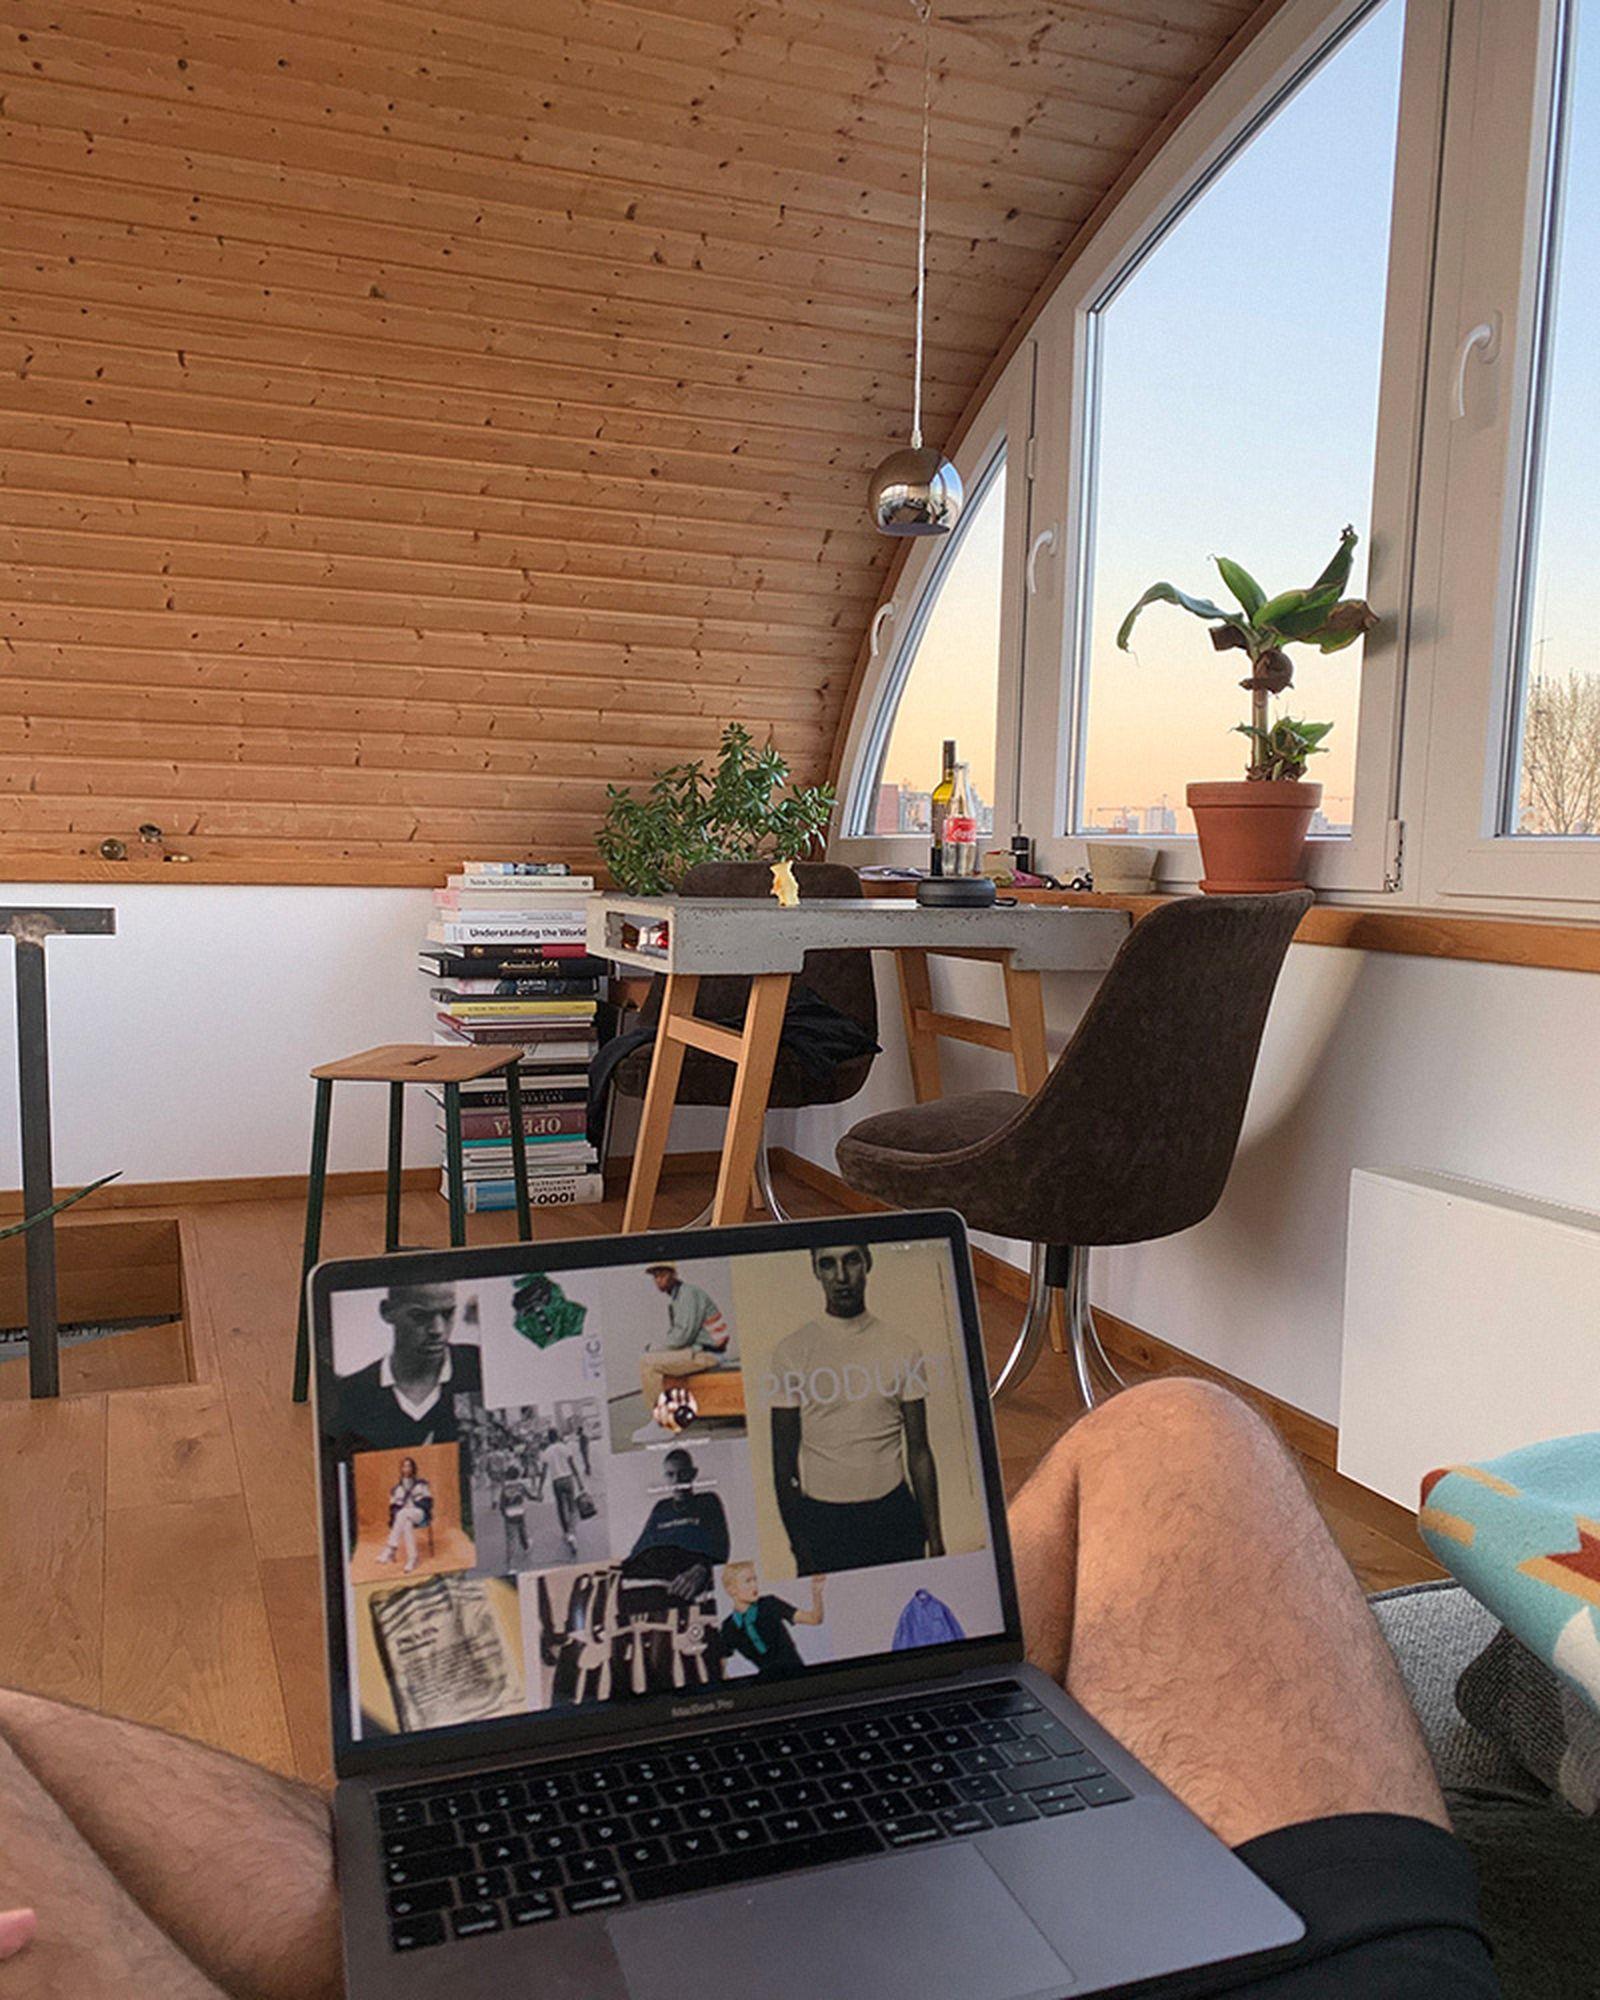 wfh-office-tour-look-inside-home-offices-herbert-05